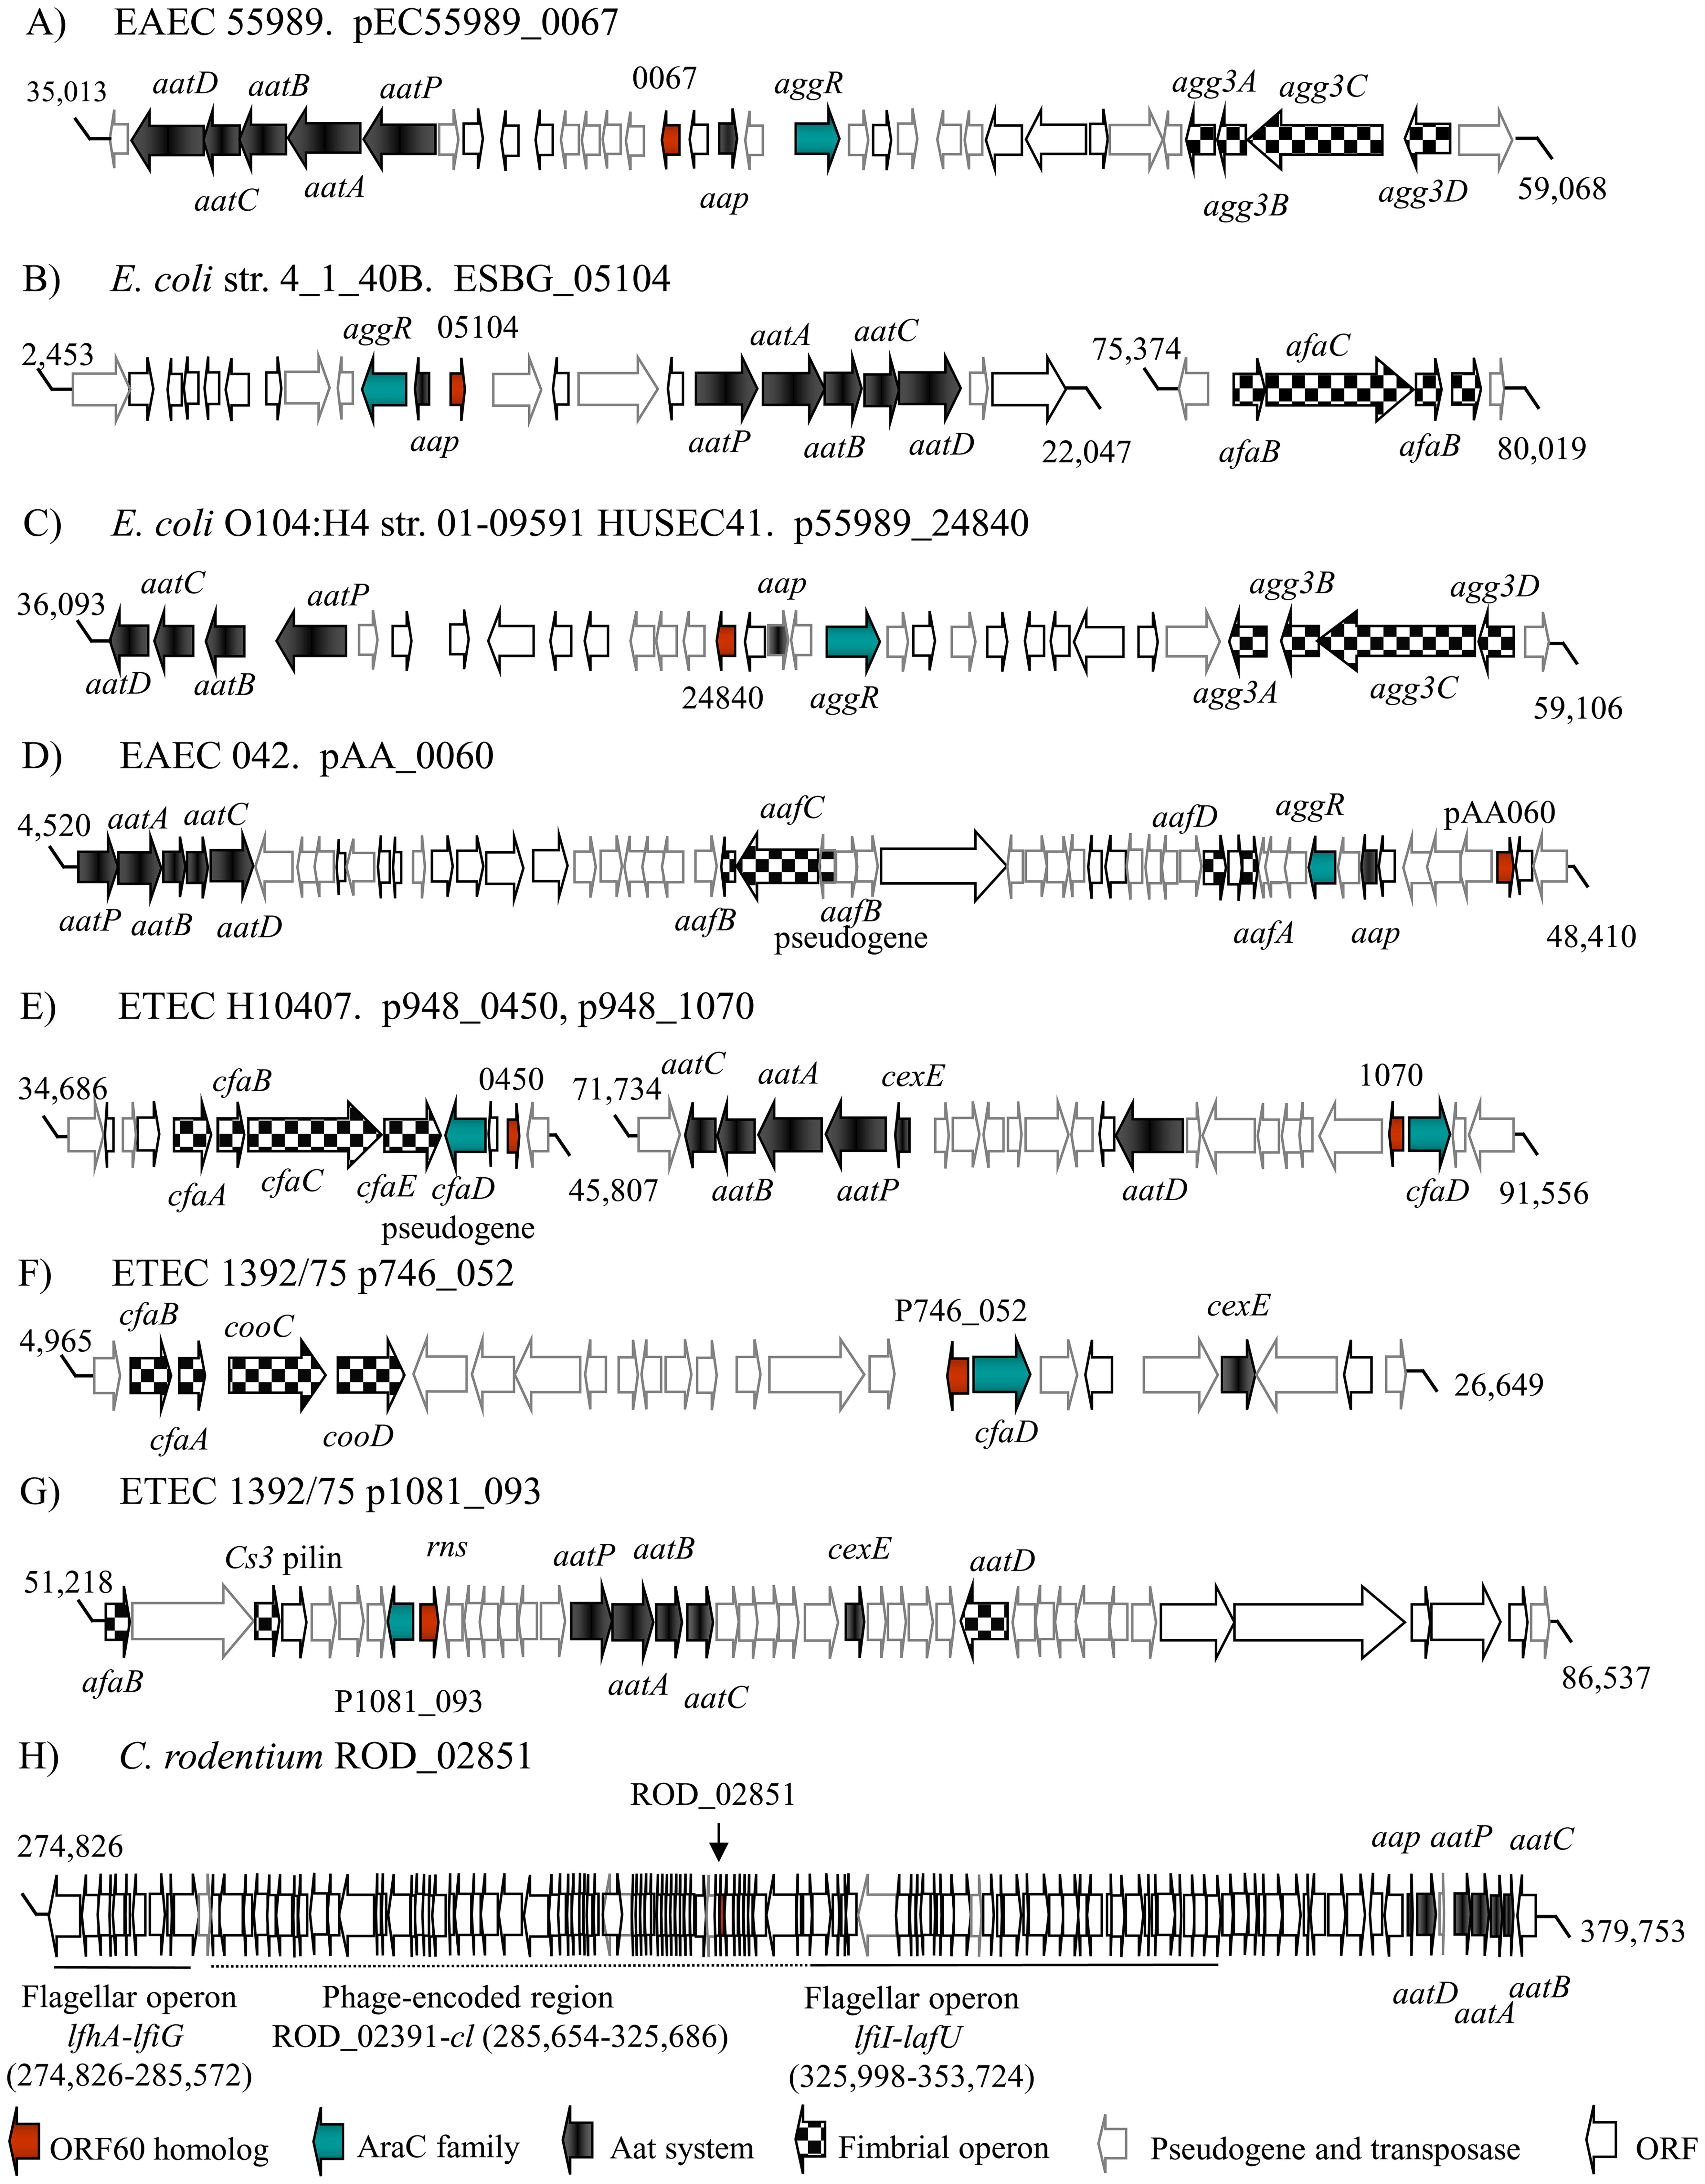 Genetic organization of orf60 homologs.